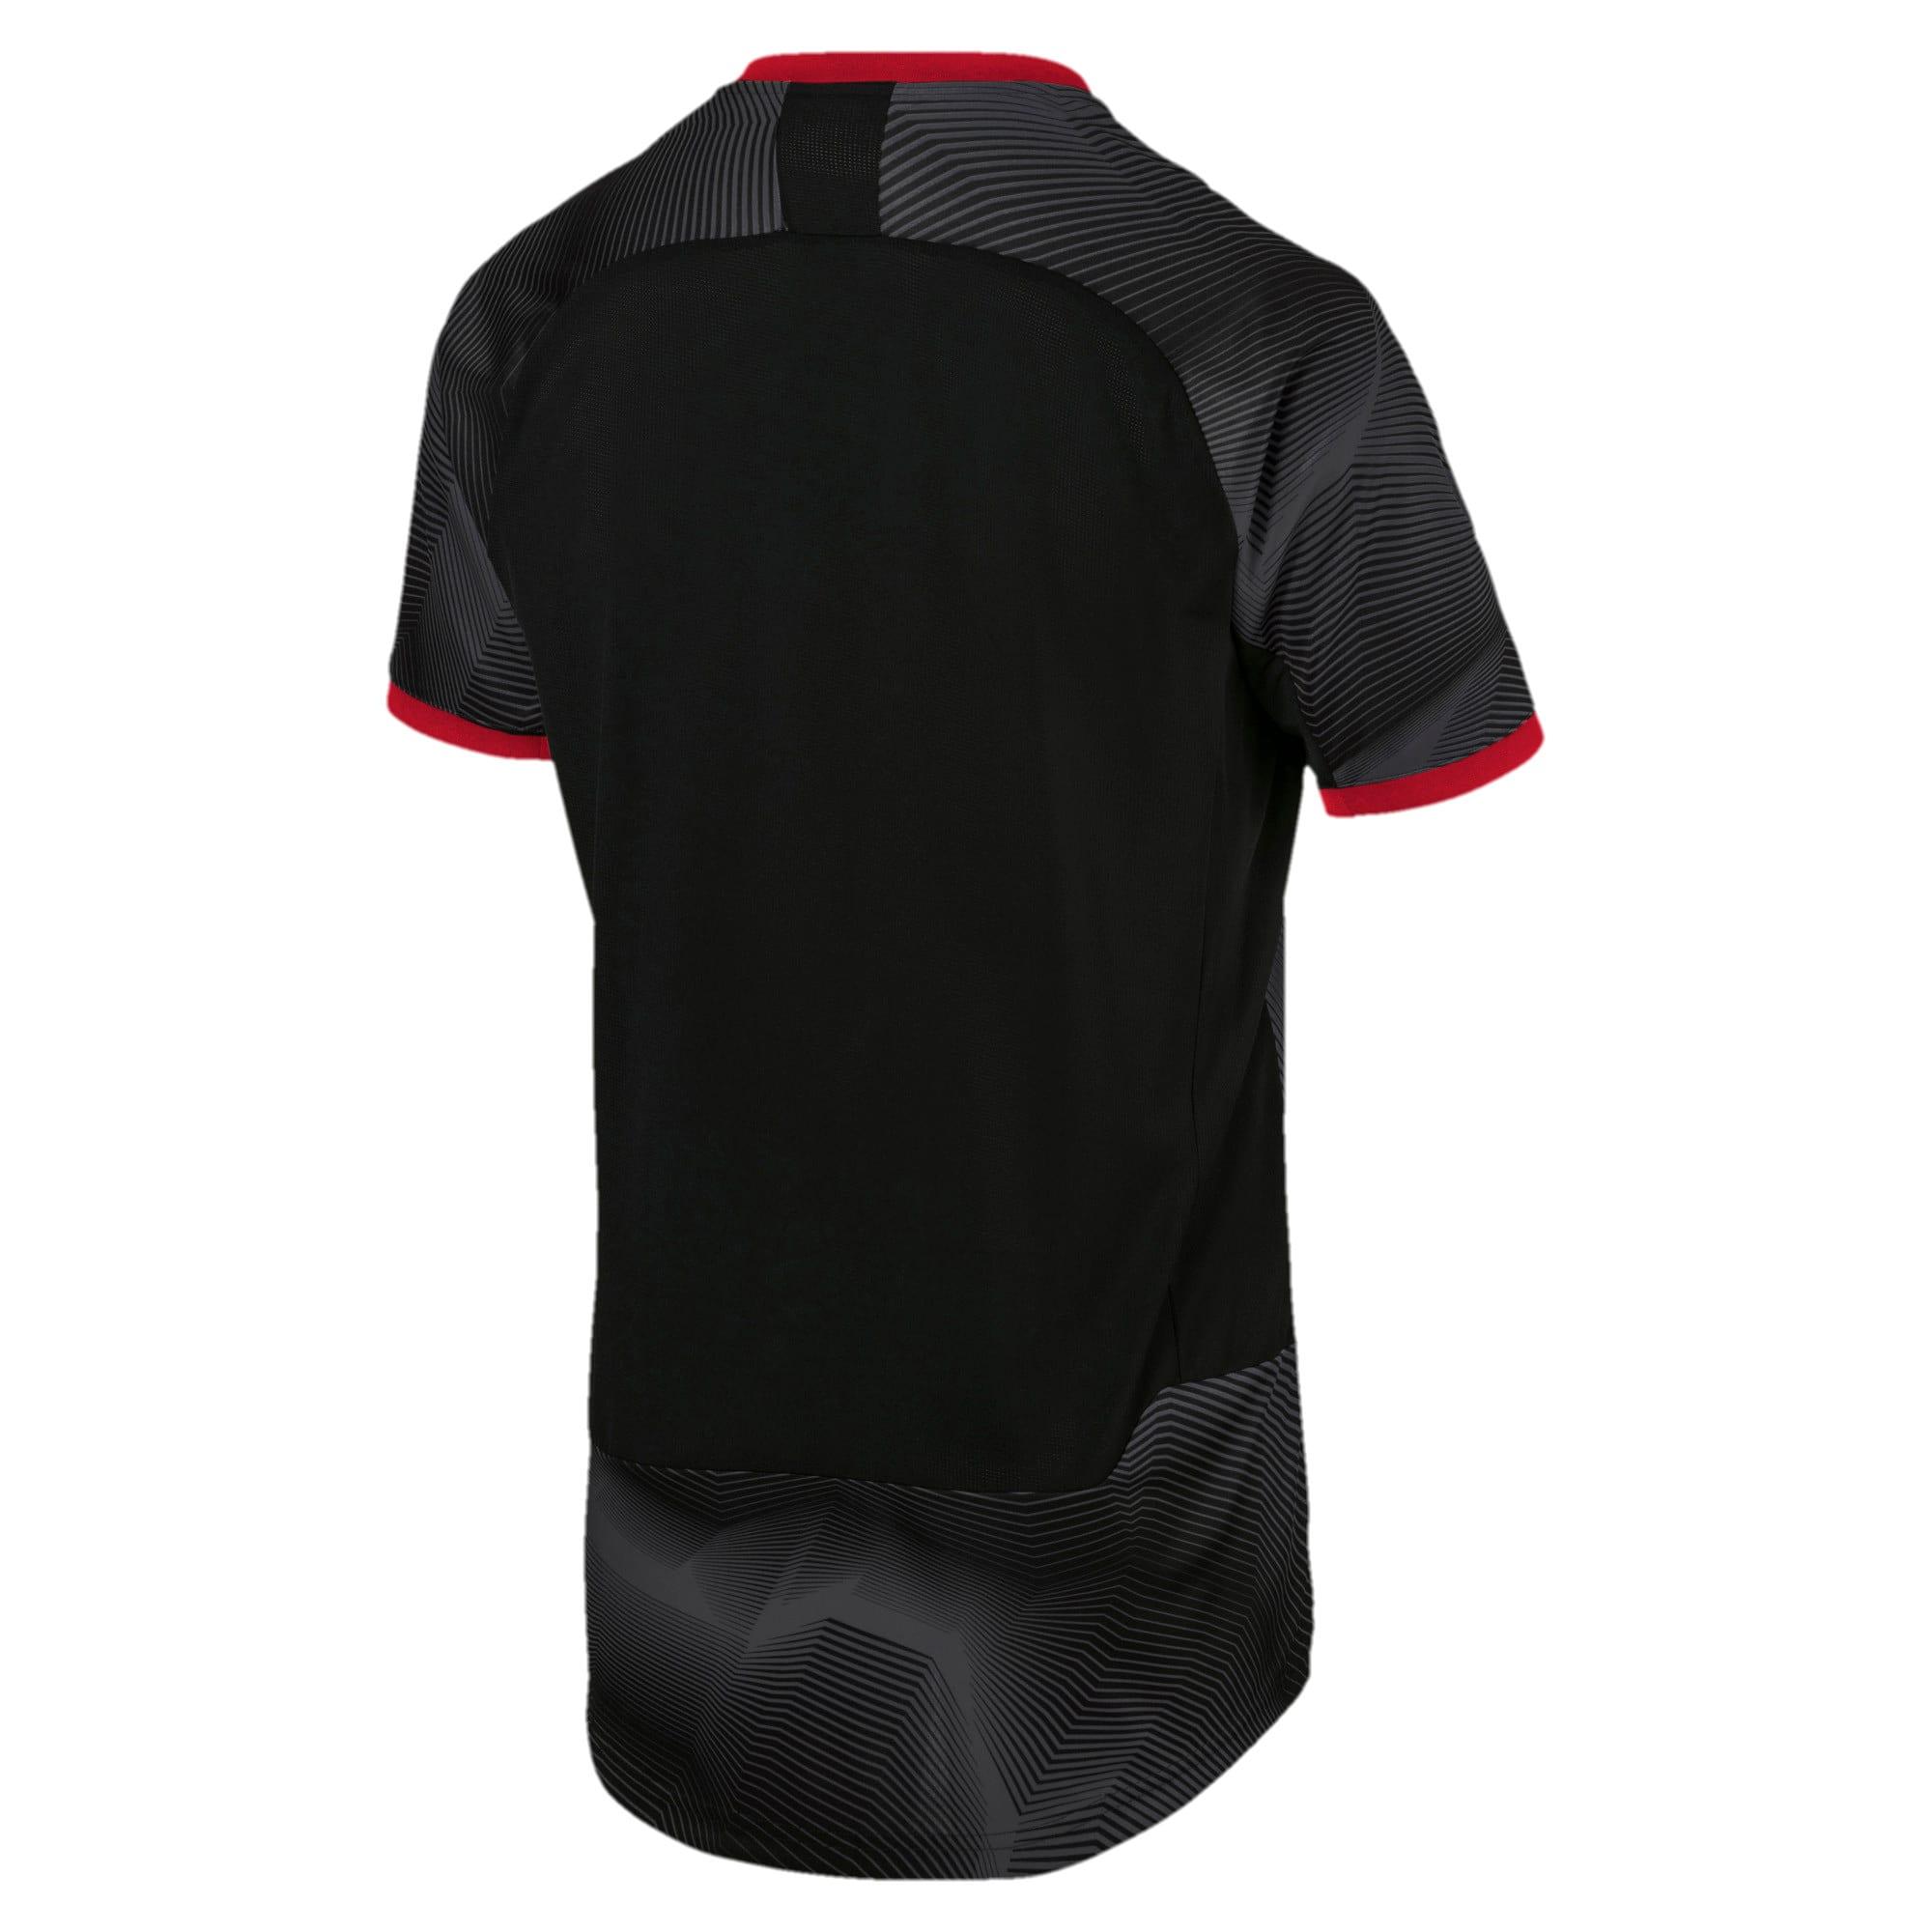 Thumbnail 3 of AC Milan Stadium Jersey, Puma Black-Dark Shadow, medium